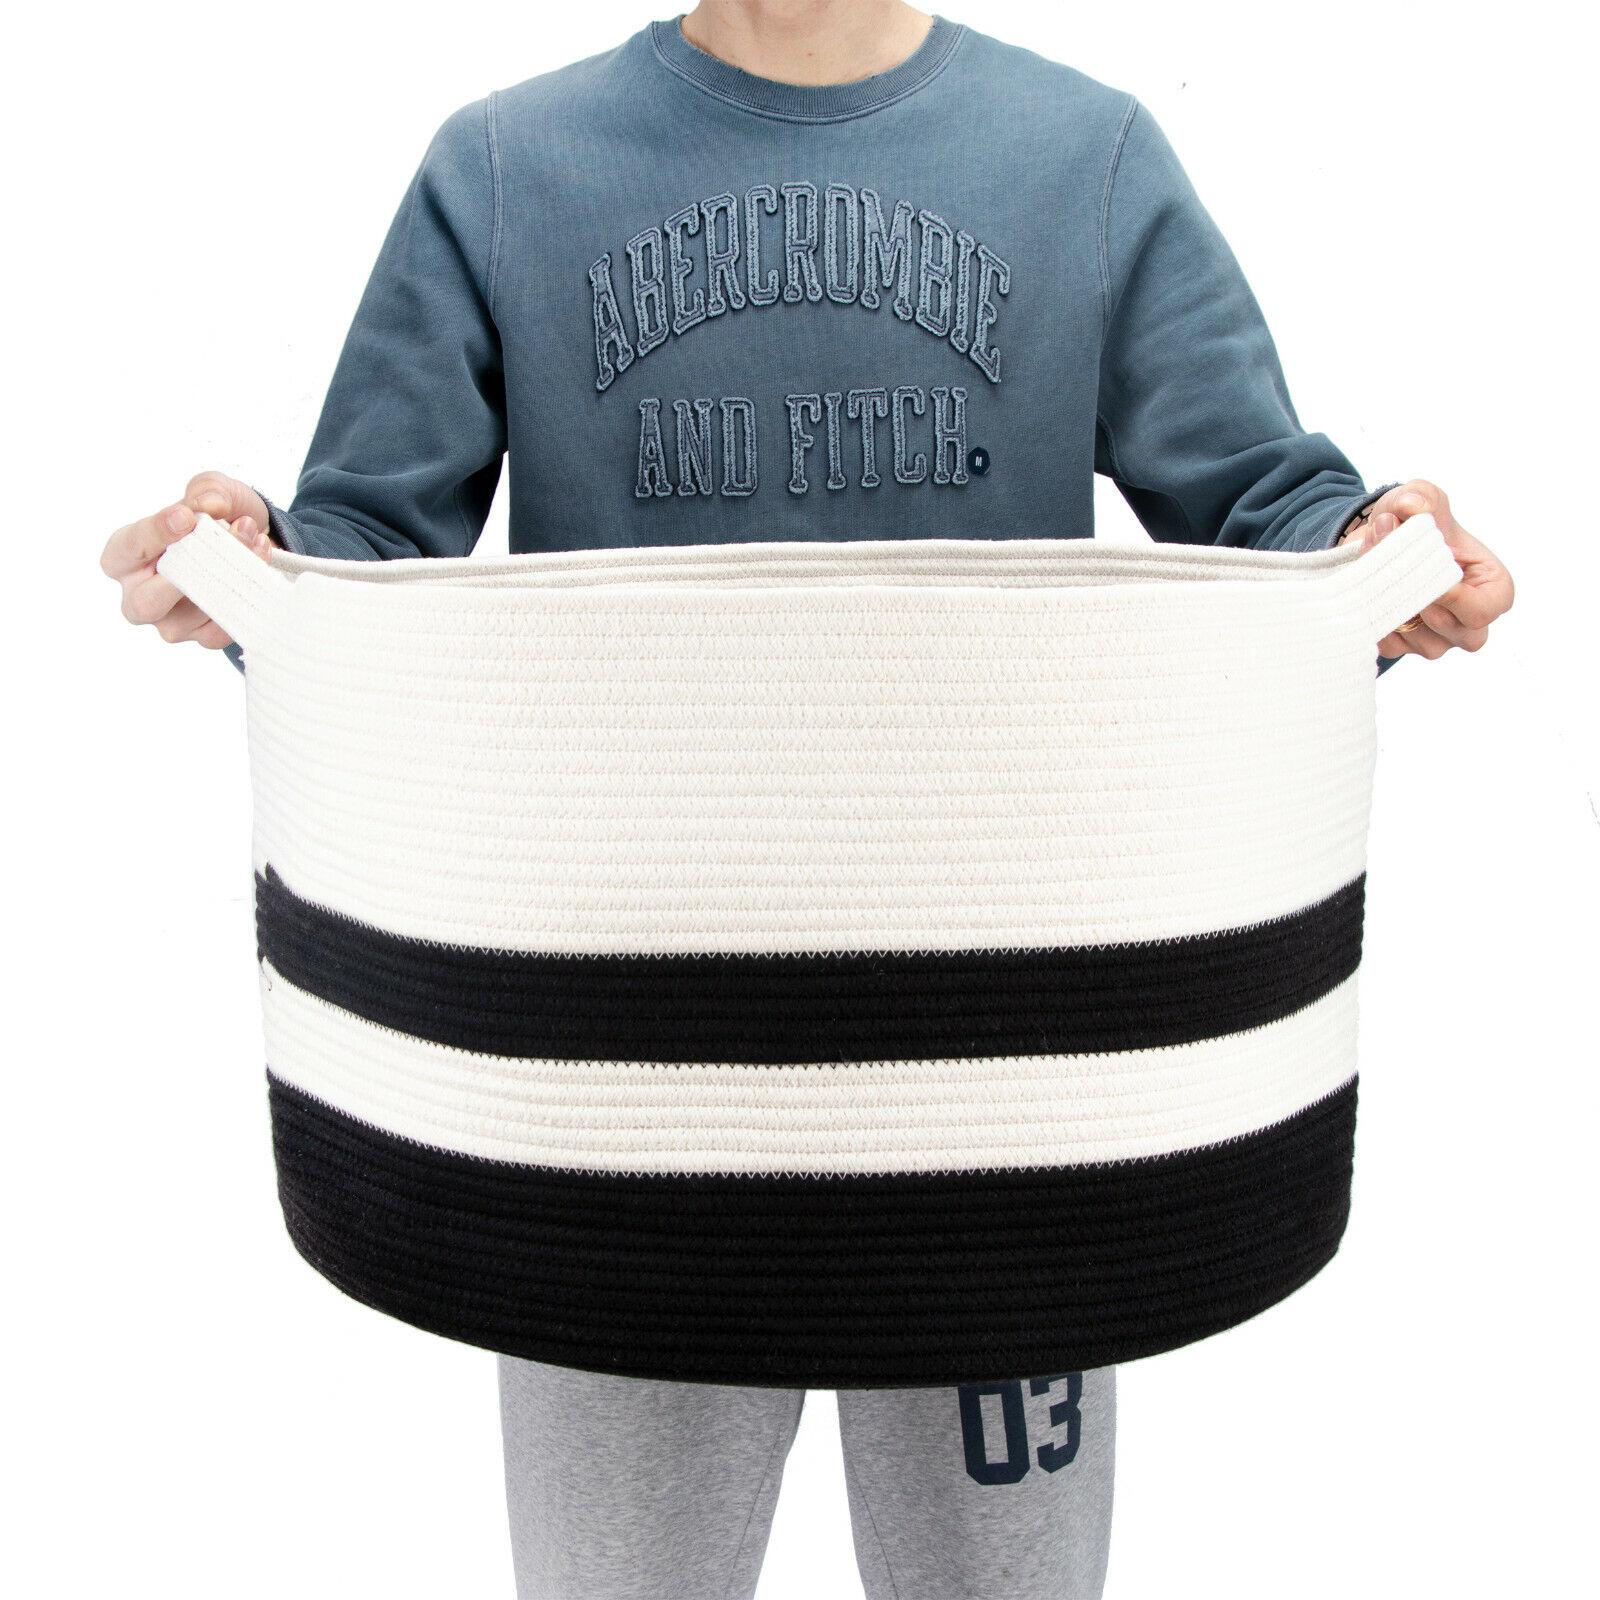 Nursery 20x20x13 Decorative Cotton Rope Basket With Weave Handles Grey Blanket Basket Large Laundry Hamper Toy Basket Round Woven Storage Basket Baby Samel Com Br